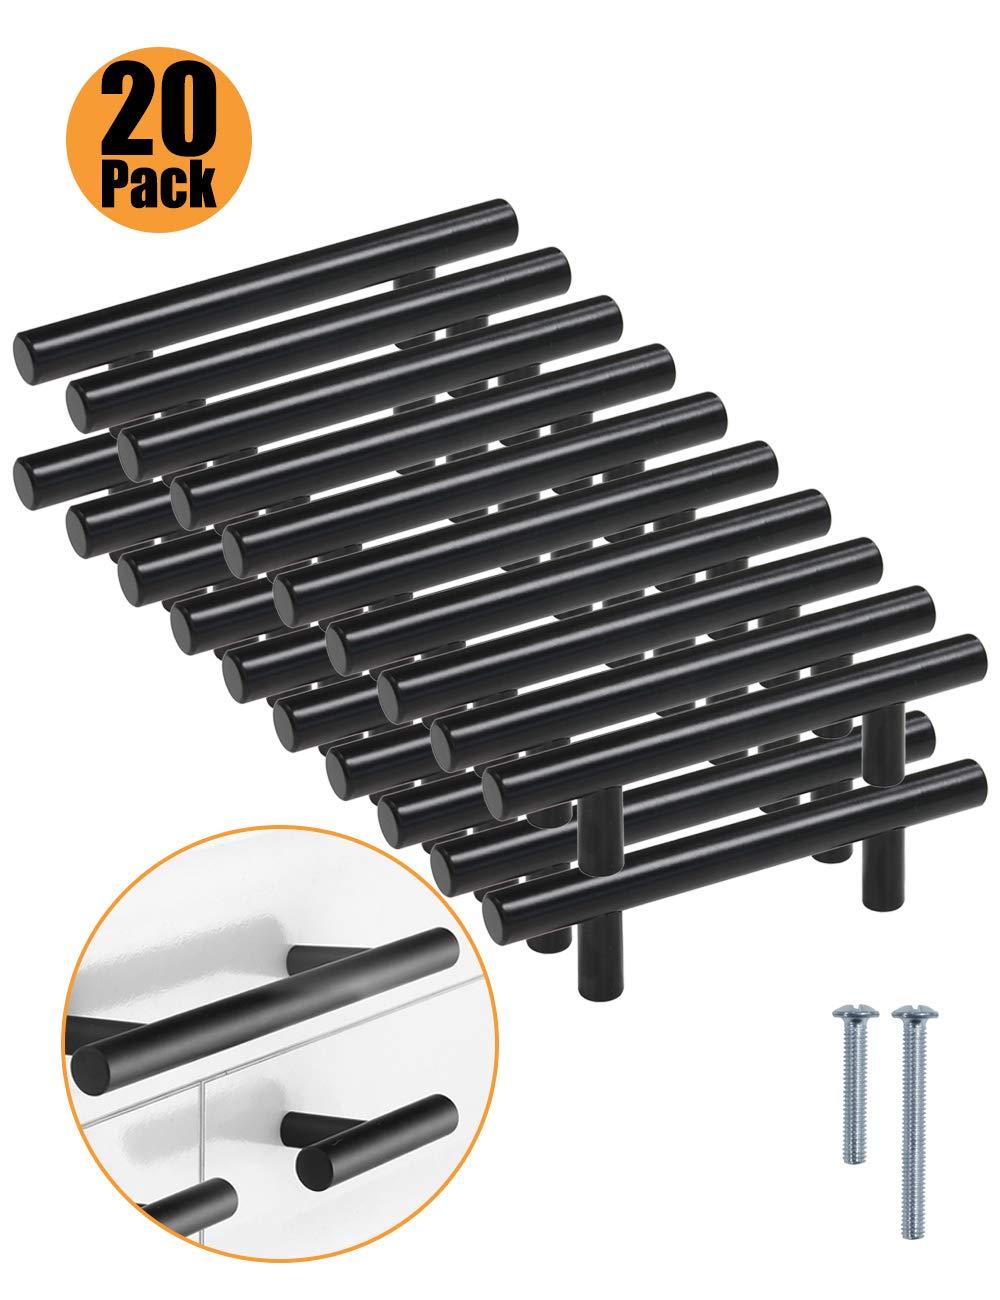 color negro serie T PinLin con tornillos de 6 x 25 mm Tiradores de acero inoxidable para puertas de armarios de cocina agujero /único negro